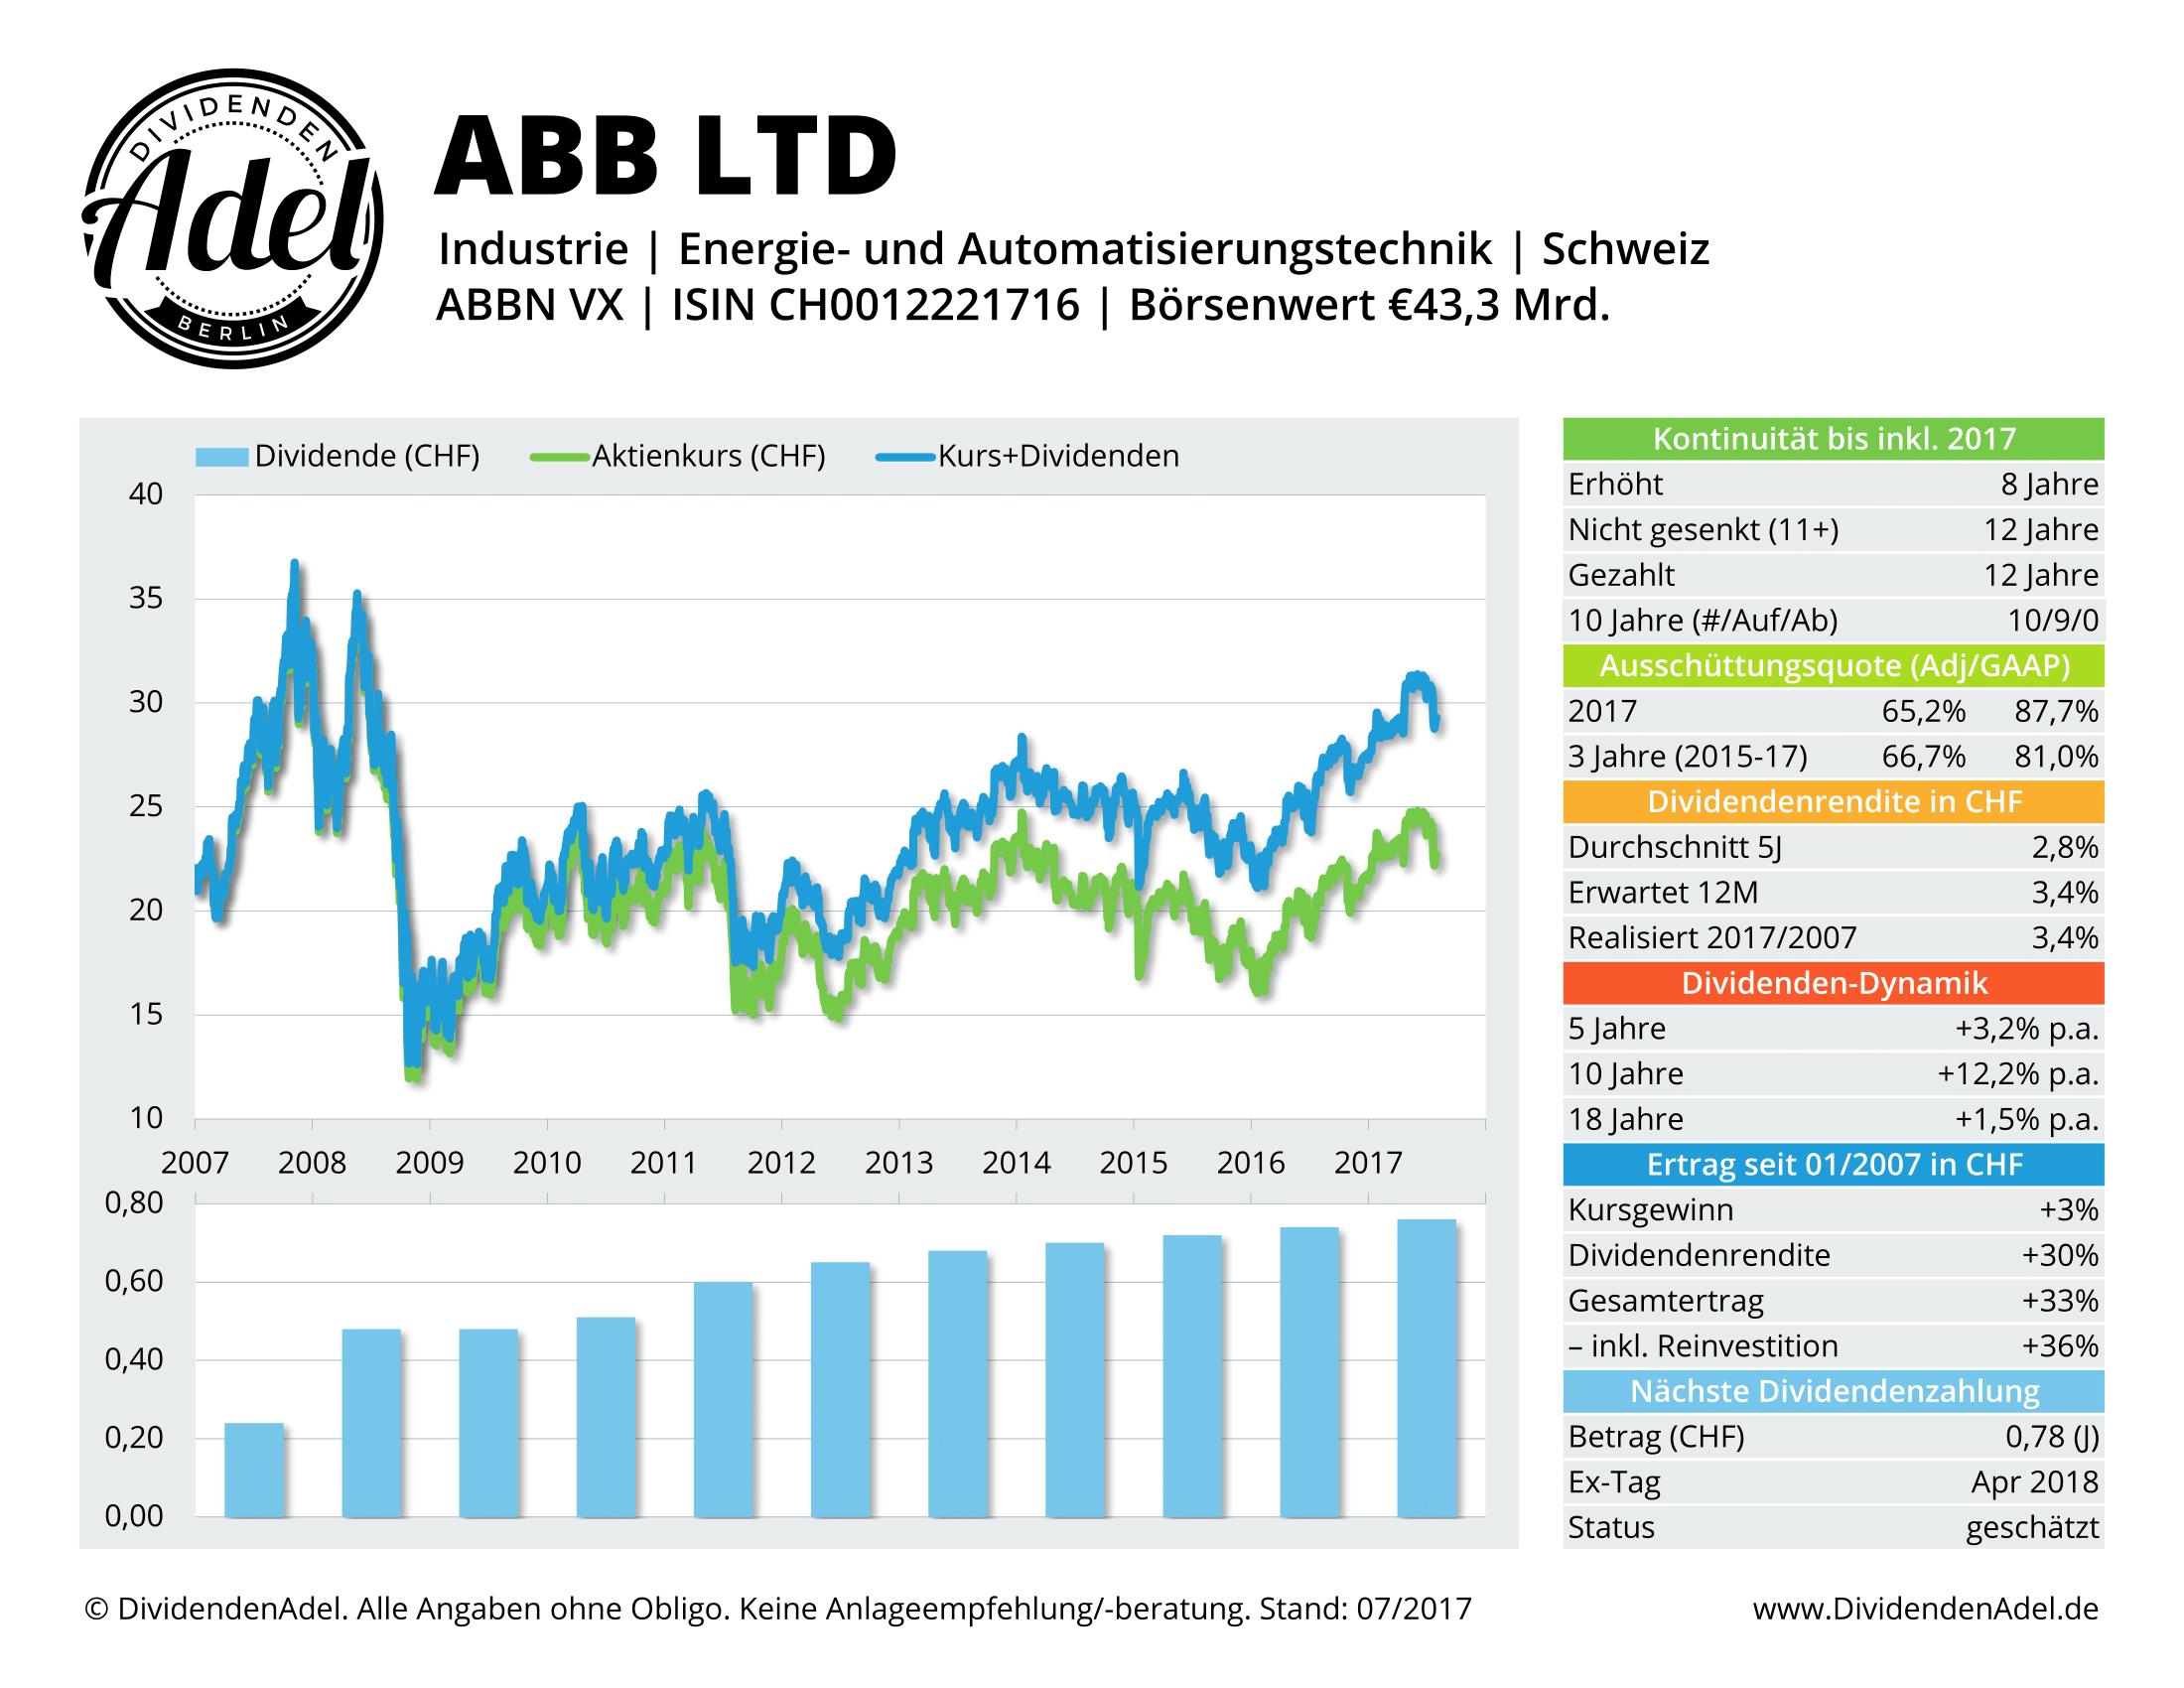 ABB LTD-REG DividendenAdel-Profil